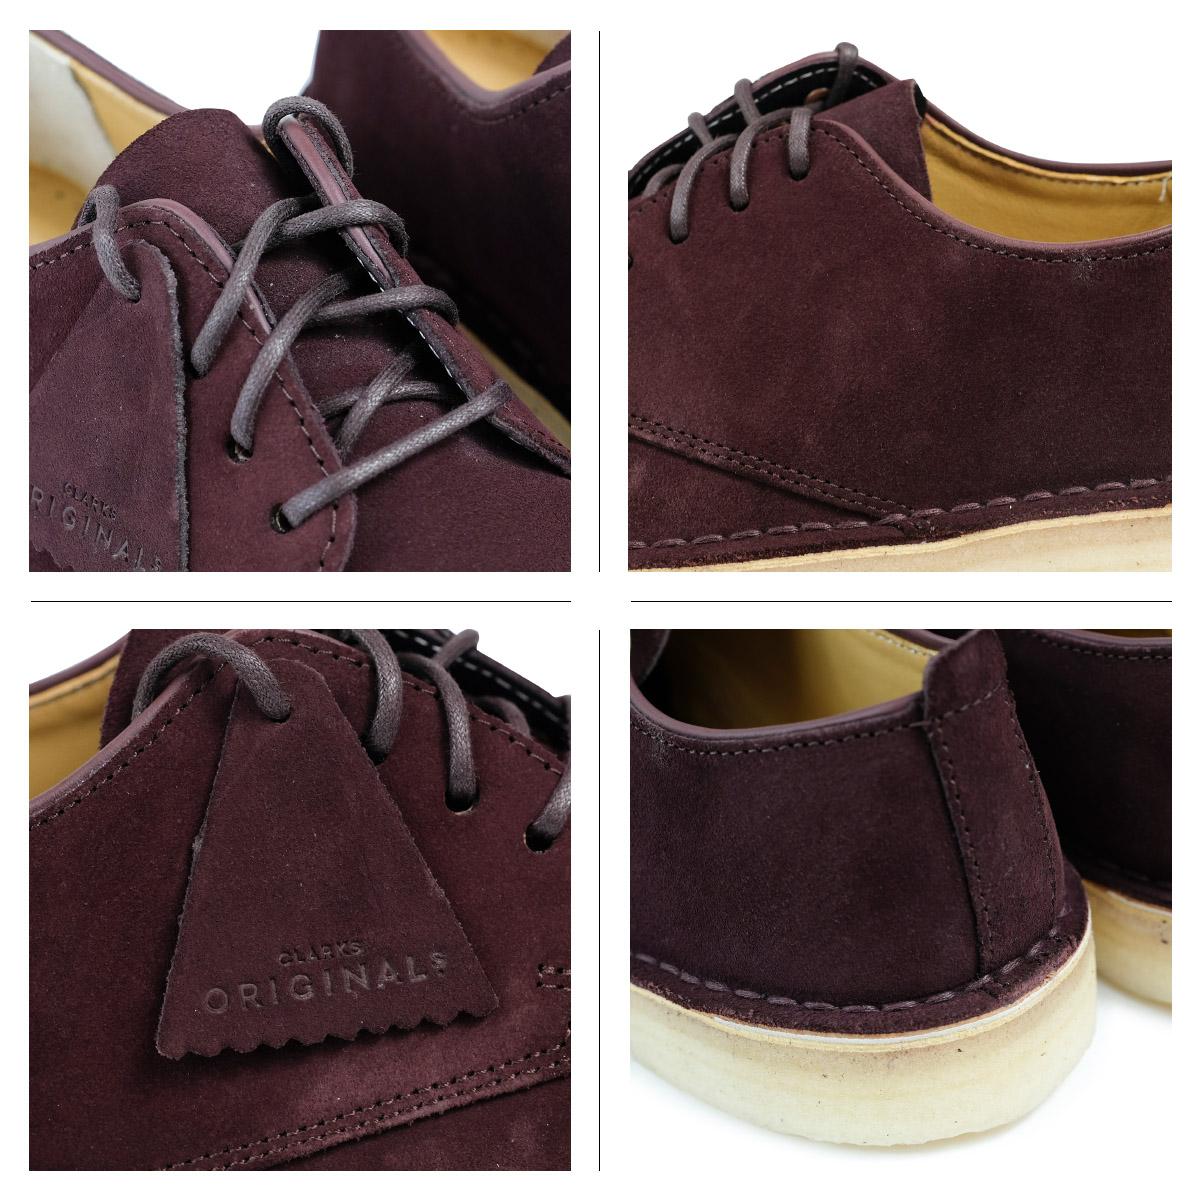 geschickte Herstellung akzeptabler Preis heißer verkauf billig Clarks DESERT LONDON kulaki dessert London shoes men 2628511 shoes burgundy  [1711]